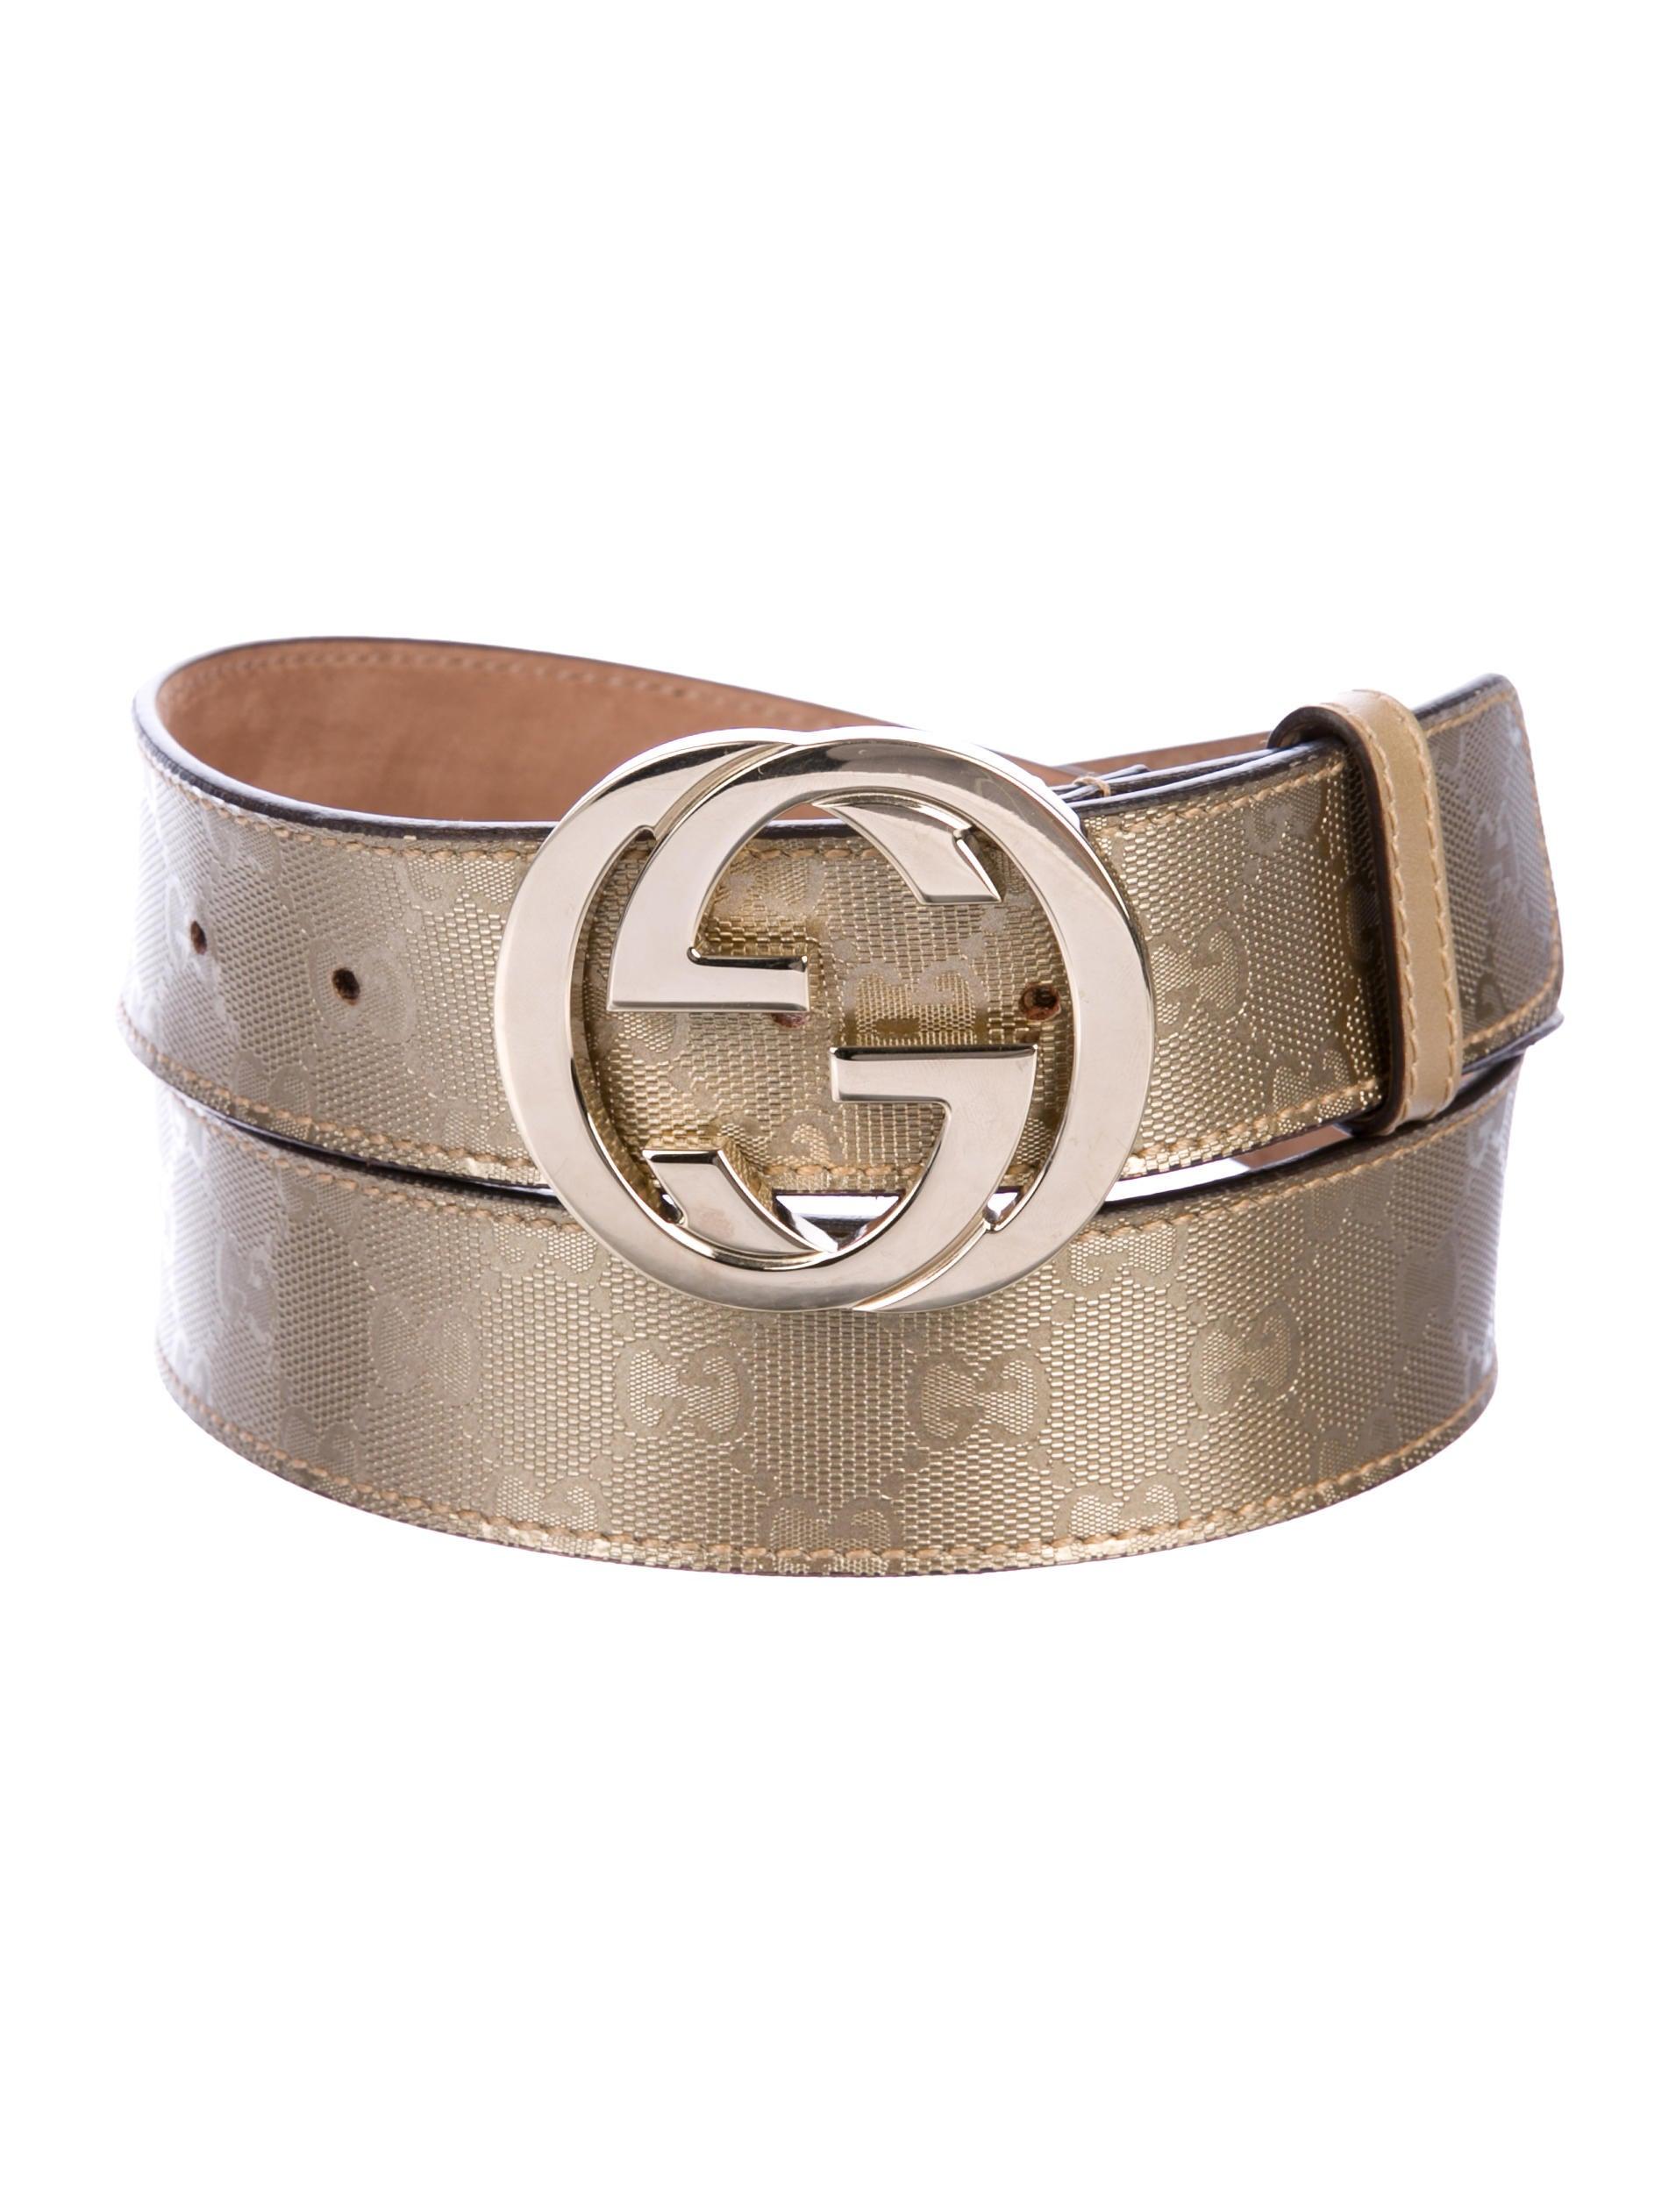 e1dc6ca14d1 Gucci GG Imprimé Belt - Accessories - GUC229950